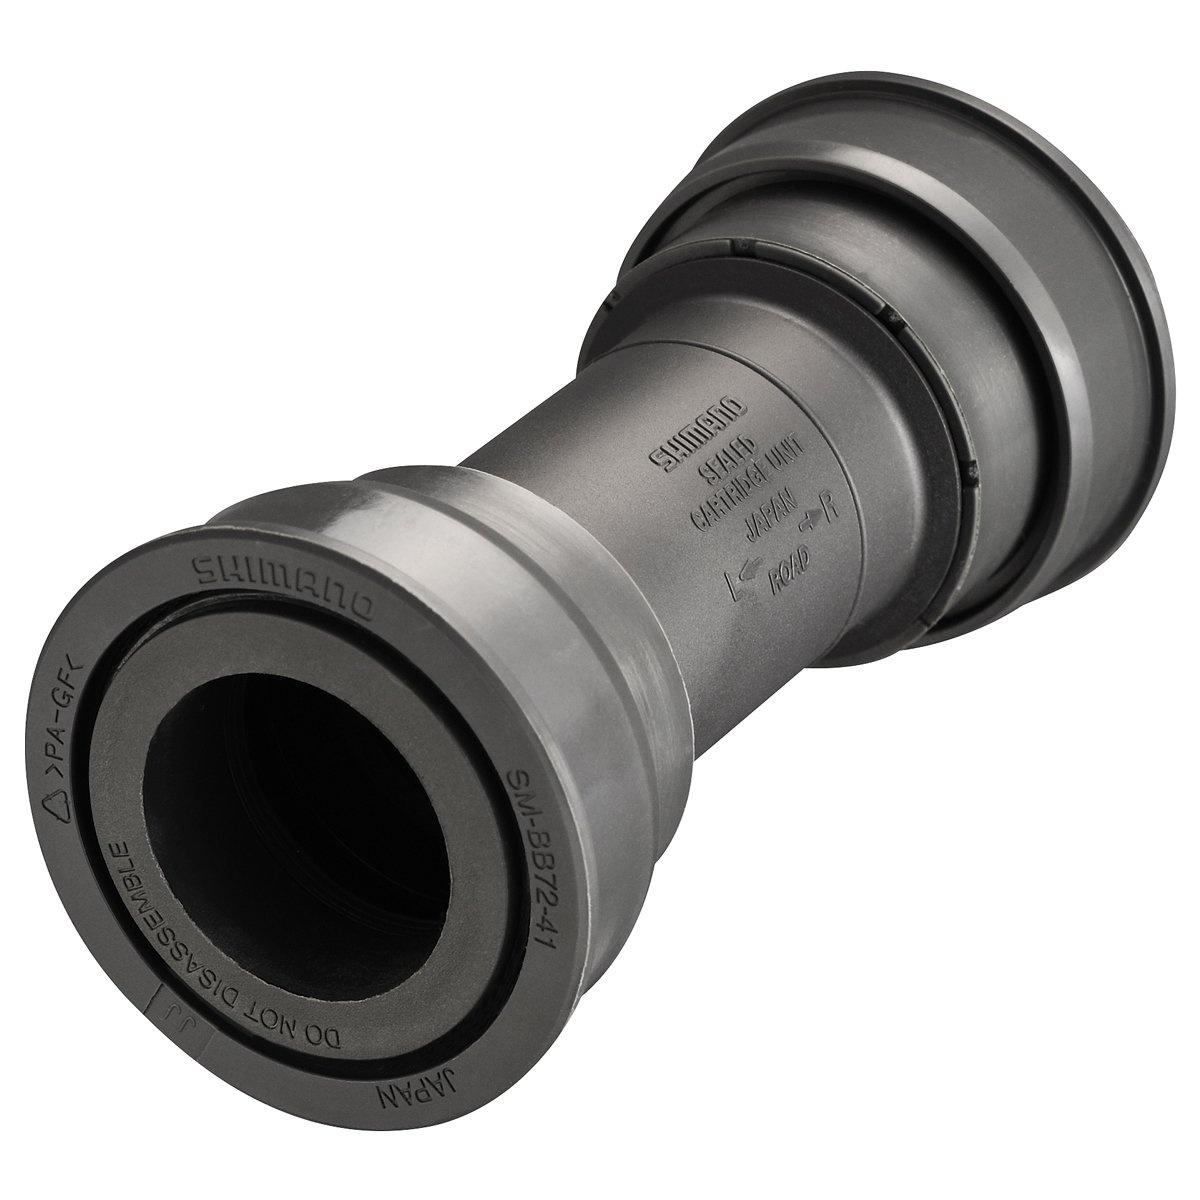 Shimano Kranklejer 86,5mm Shell SM-BB72 Press Fit